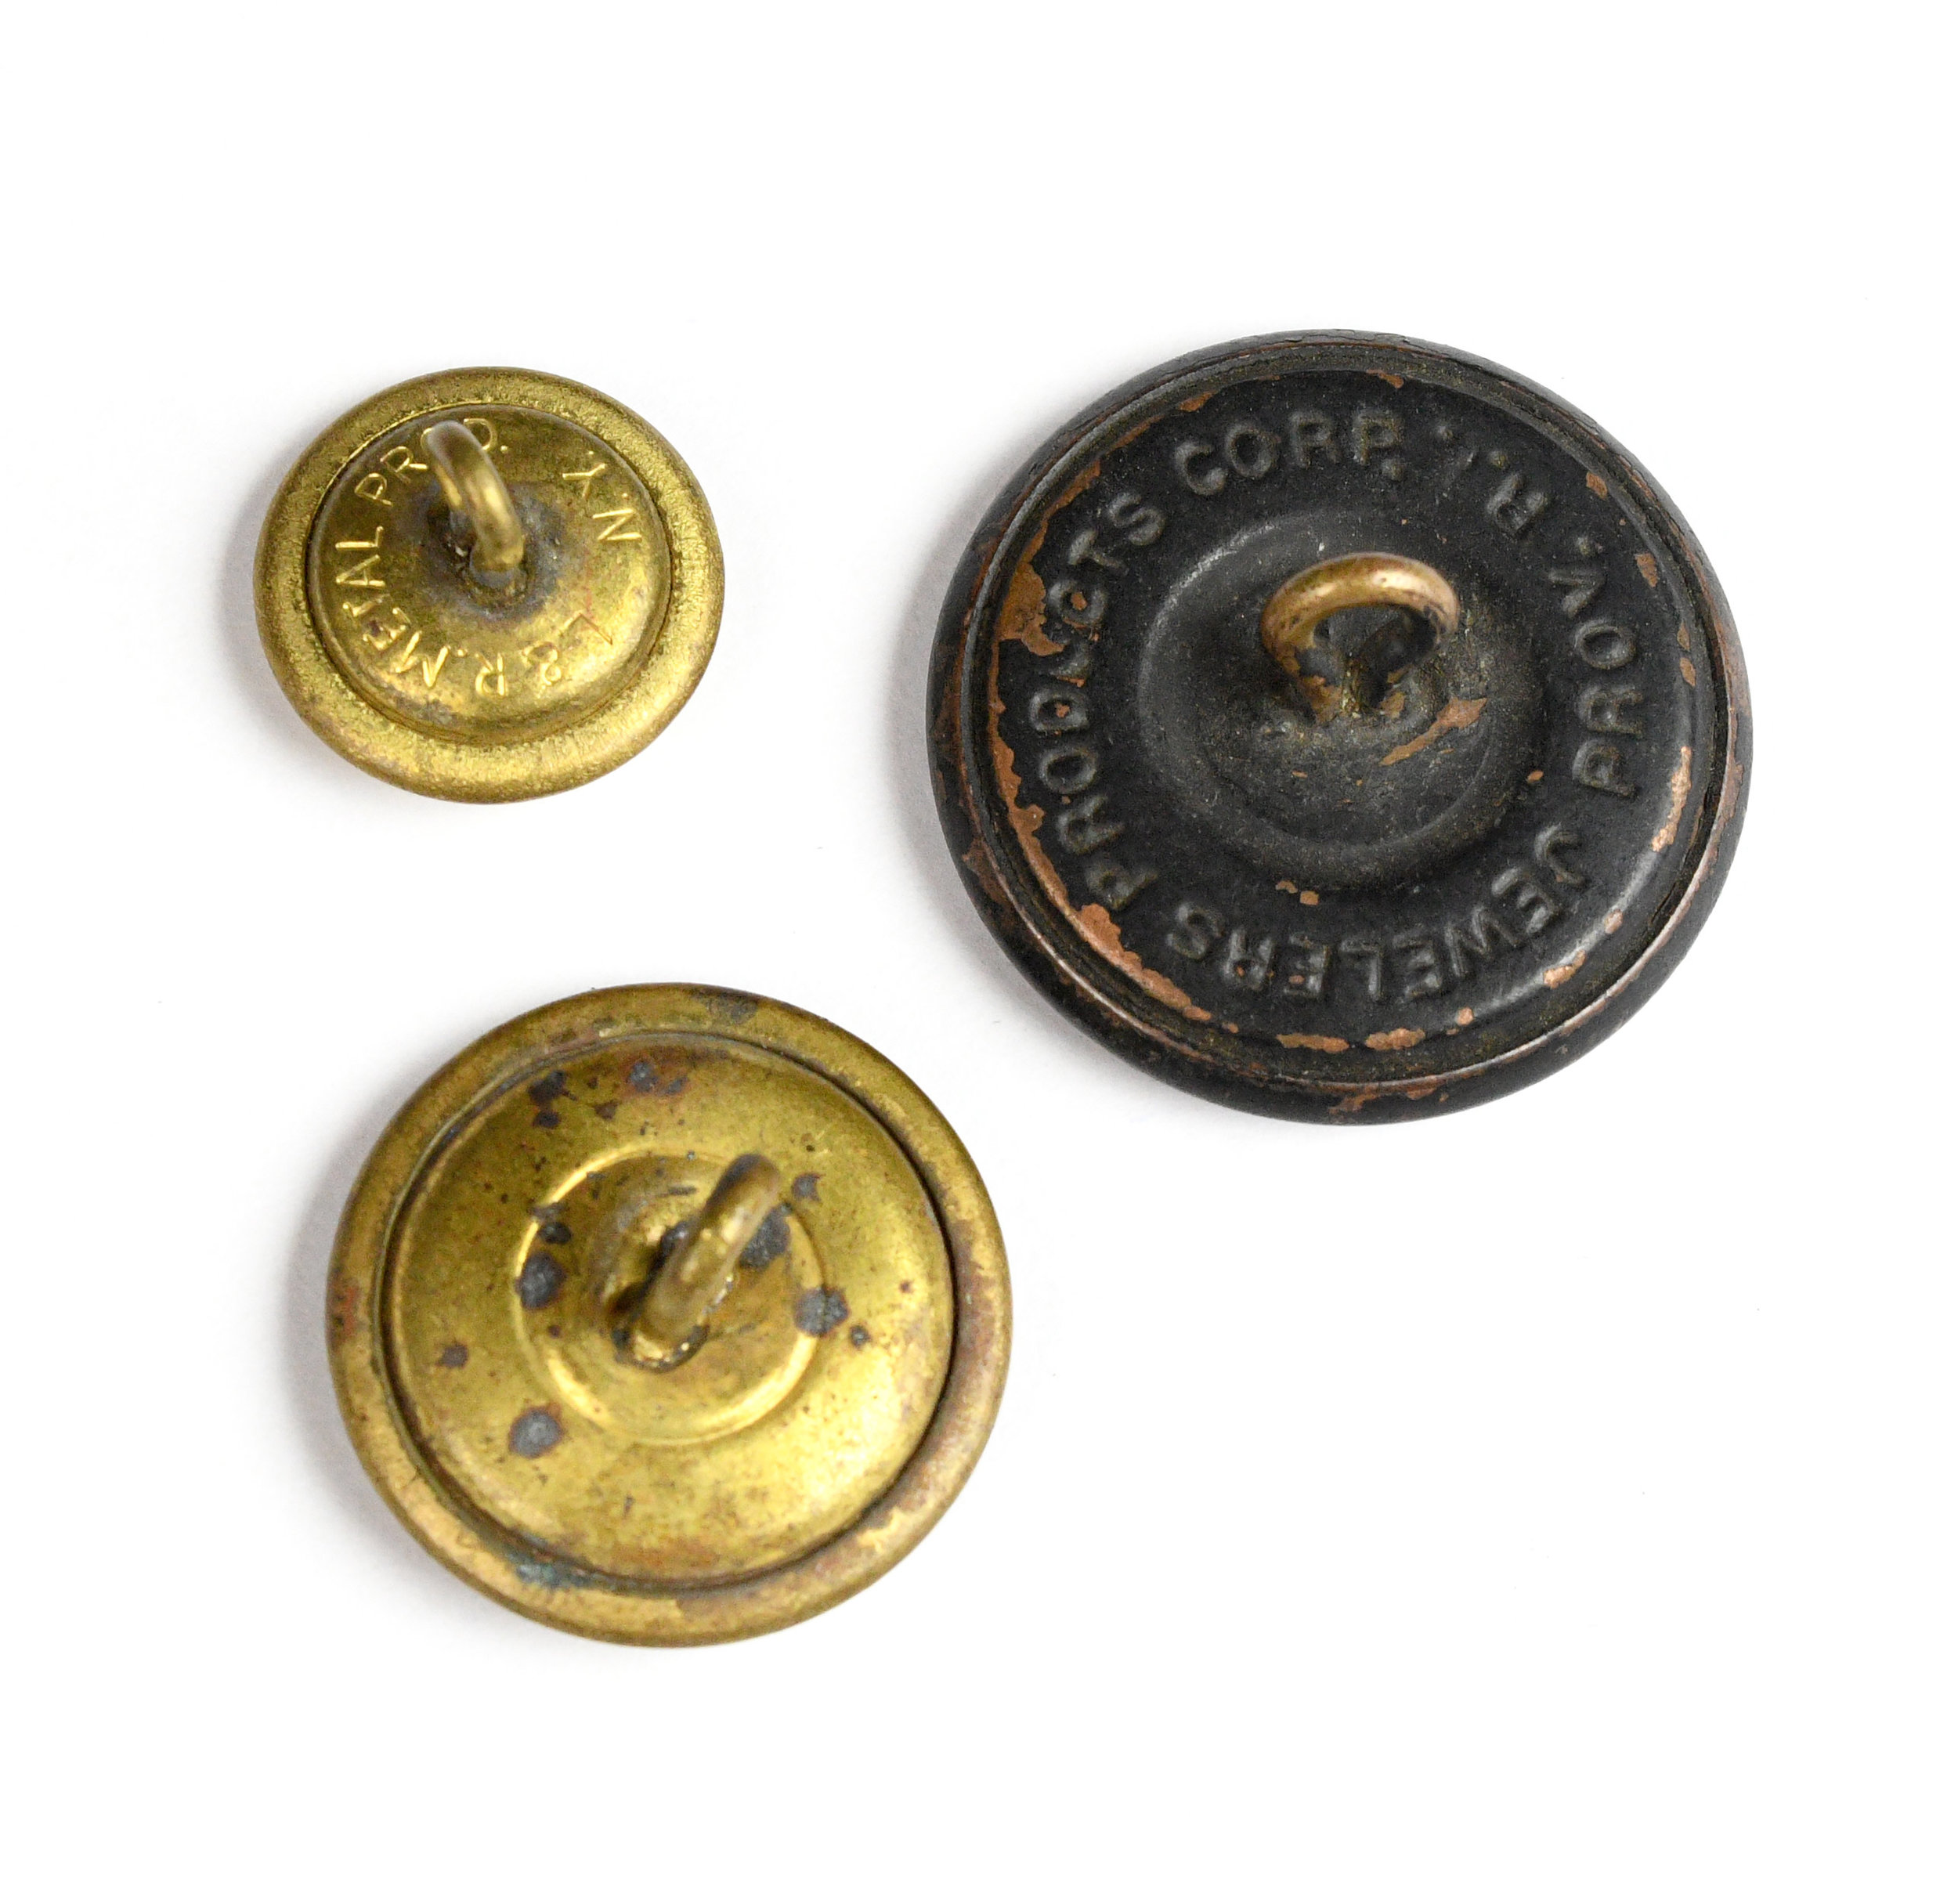 45161-brass-eagle-buttons-back-side.jpg